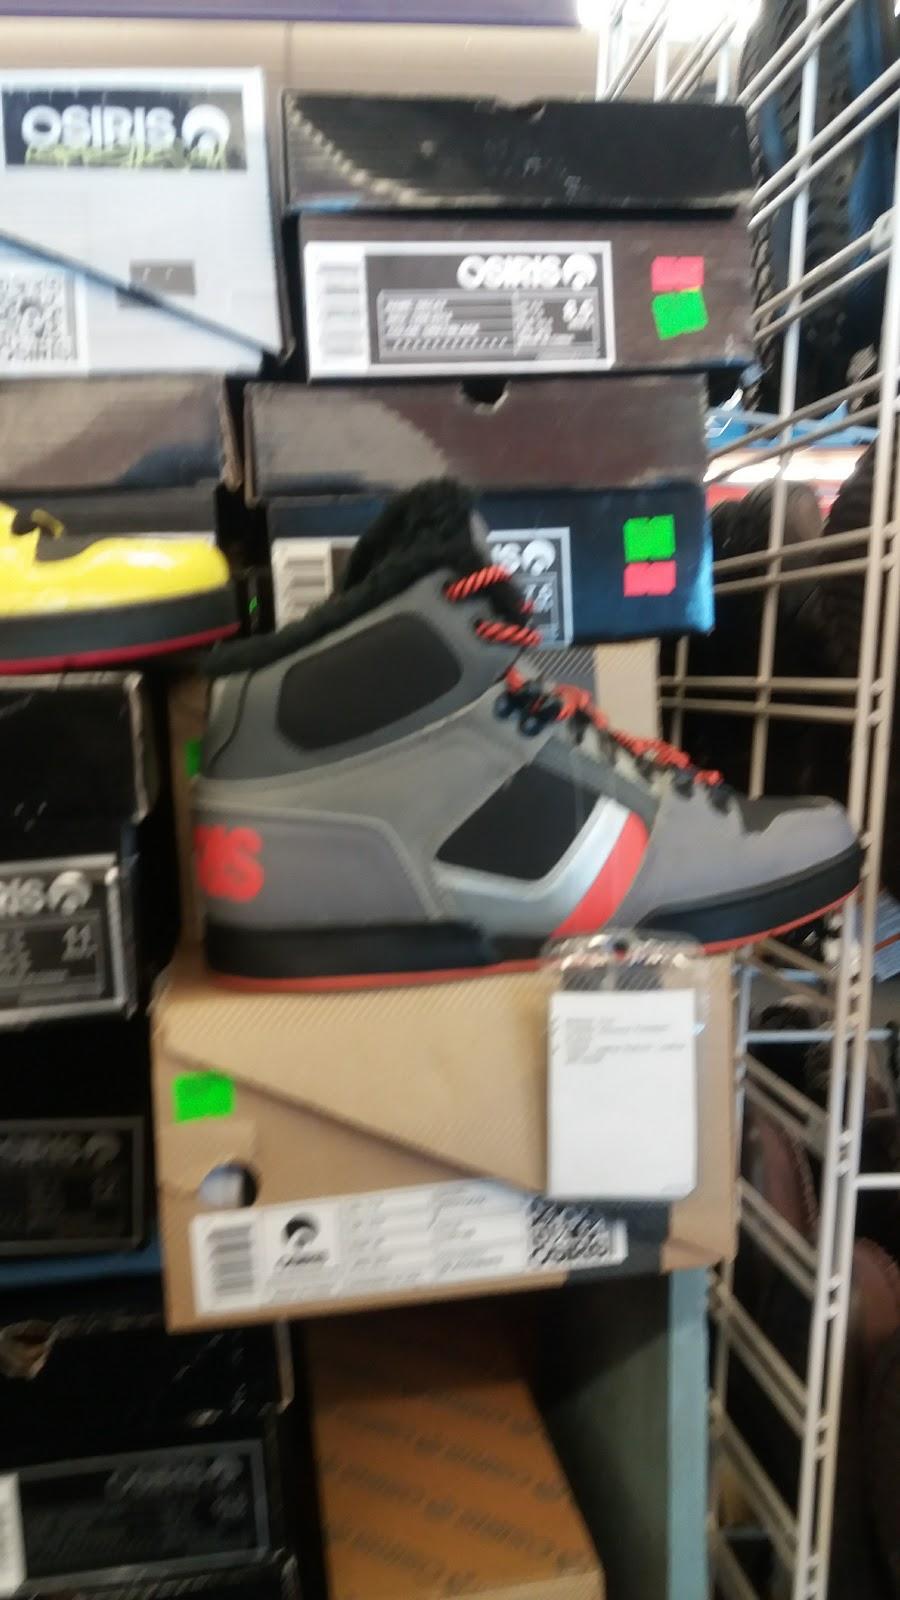 Rogans Shoes - shoe store  | Photo 10 of 10 | Address: 649 S Taylor Dr, Sheboygan, WI 53081, USA | Phone: (920) 451-0188